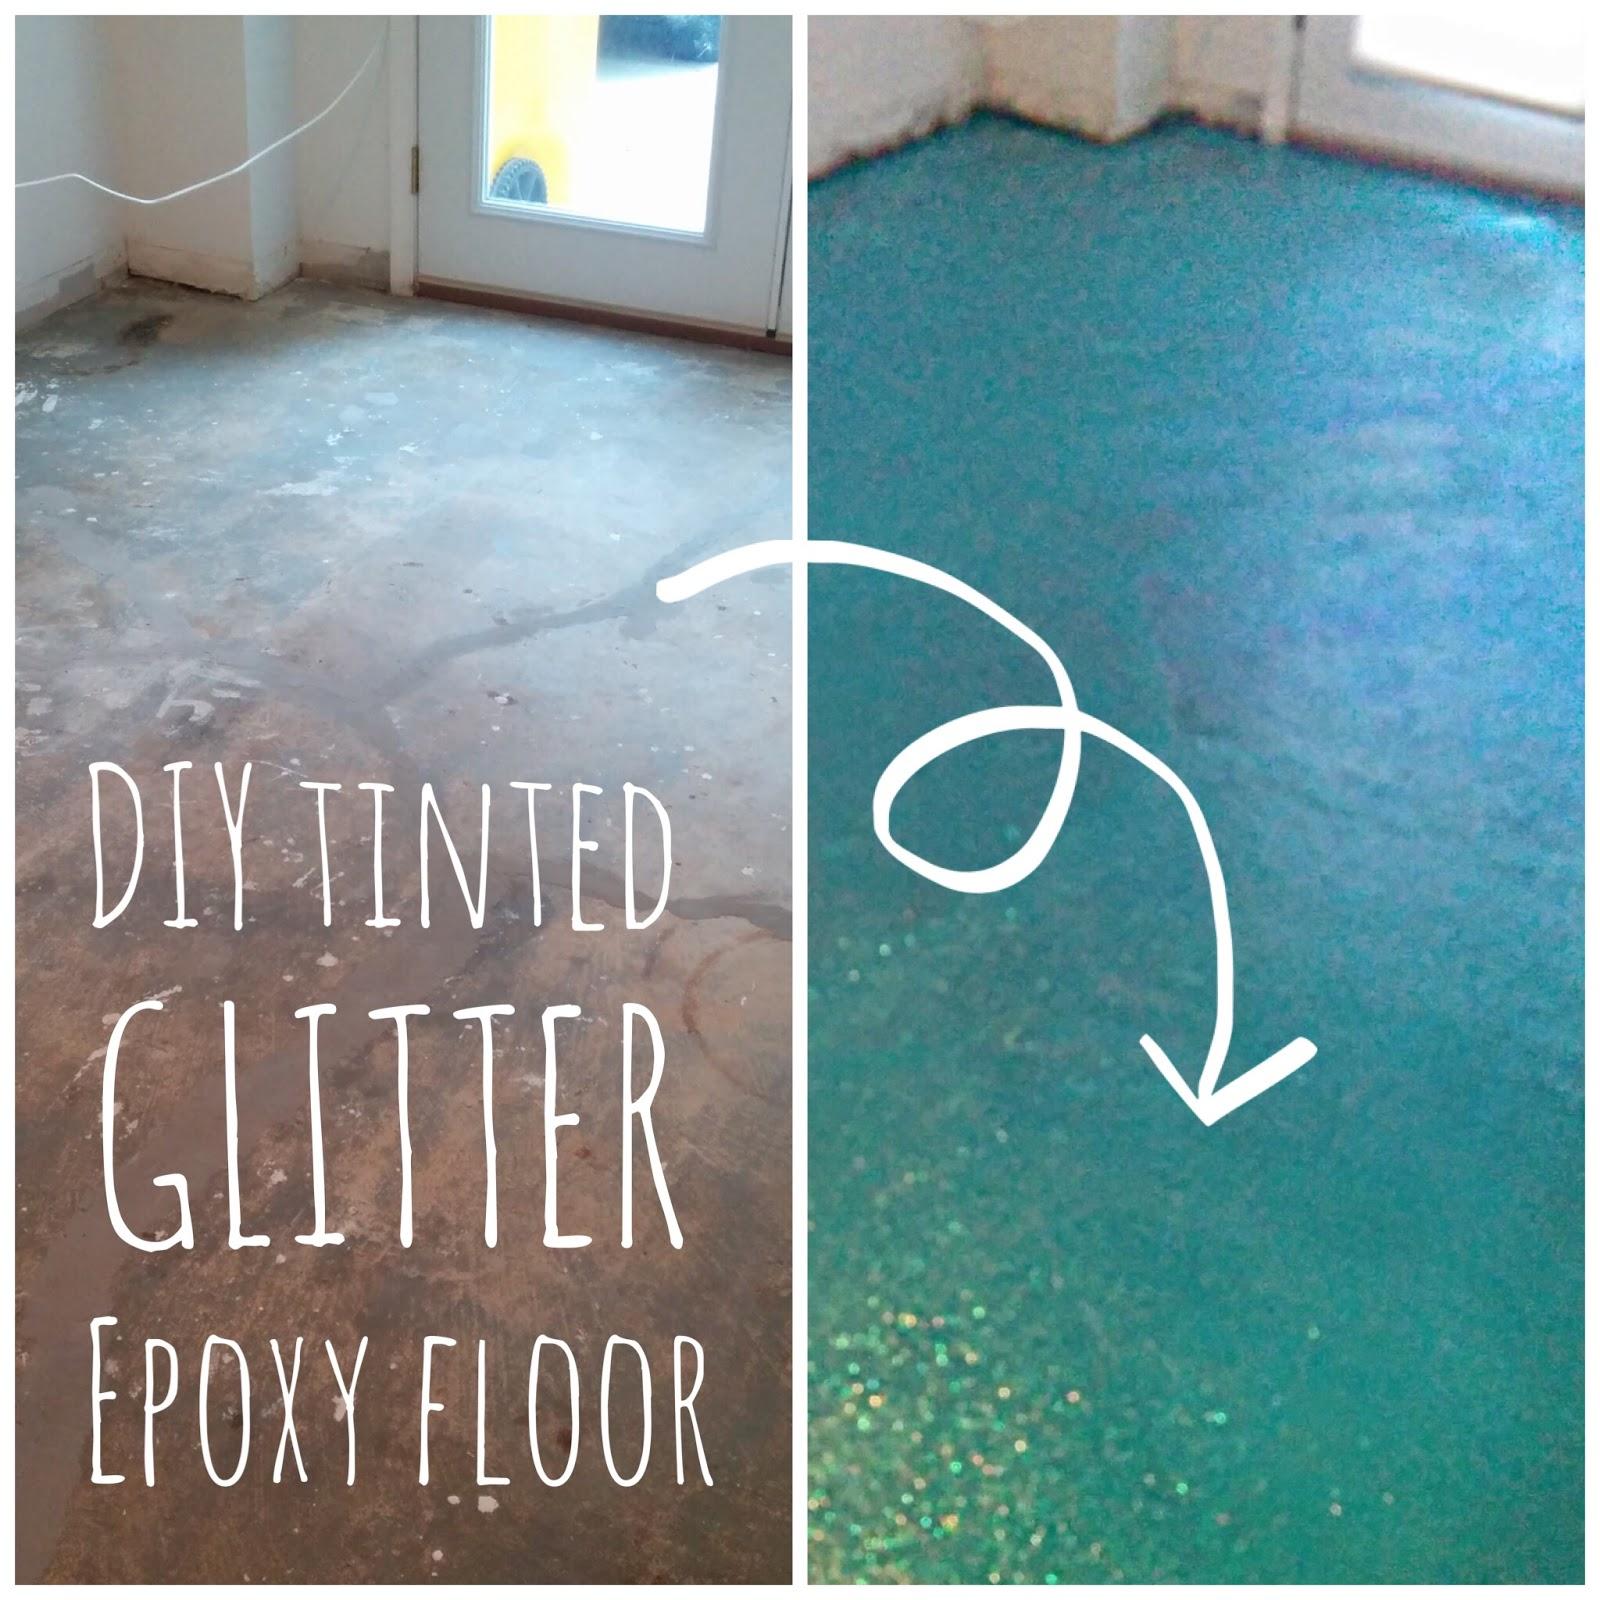 Lola Tangled DIY Turquoise Glitter Epoxy Floor